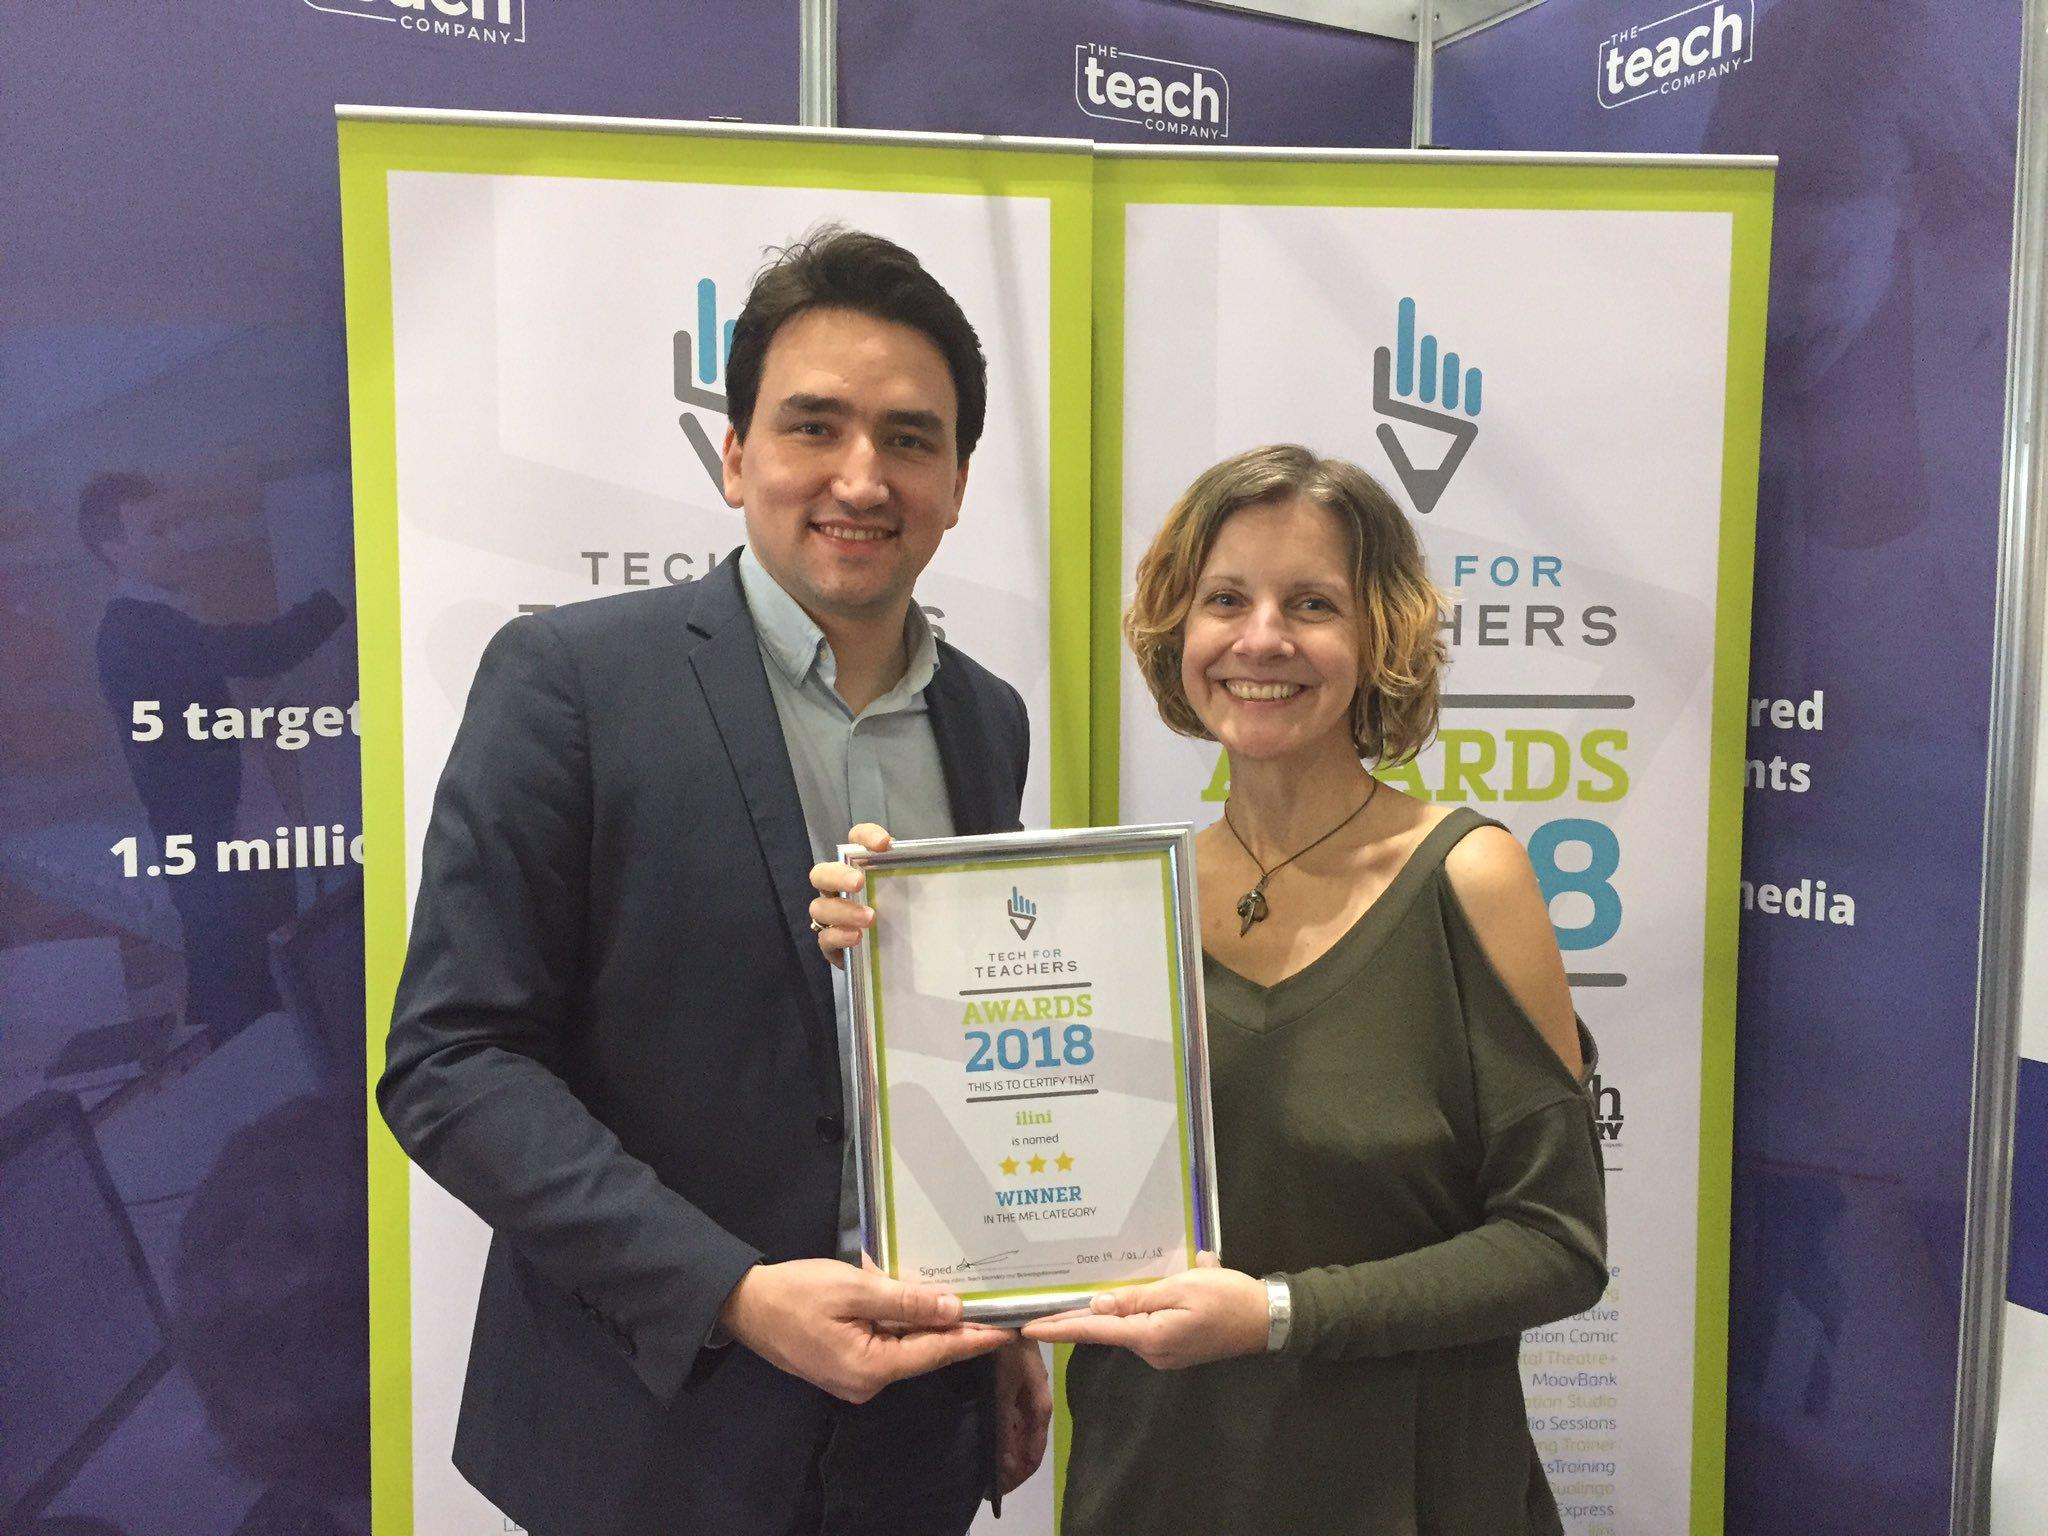 Tech for Teachers Awards - Ceremony